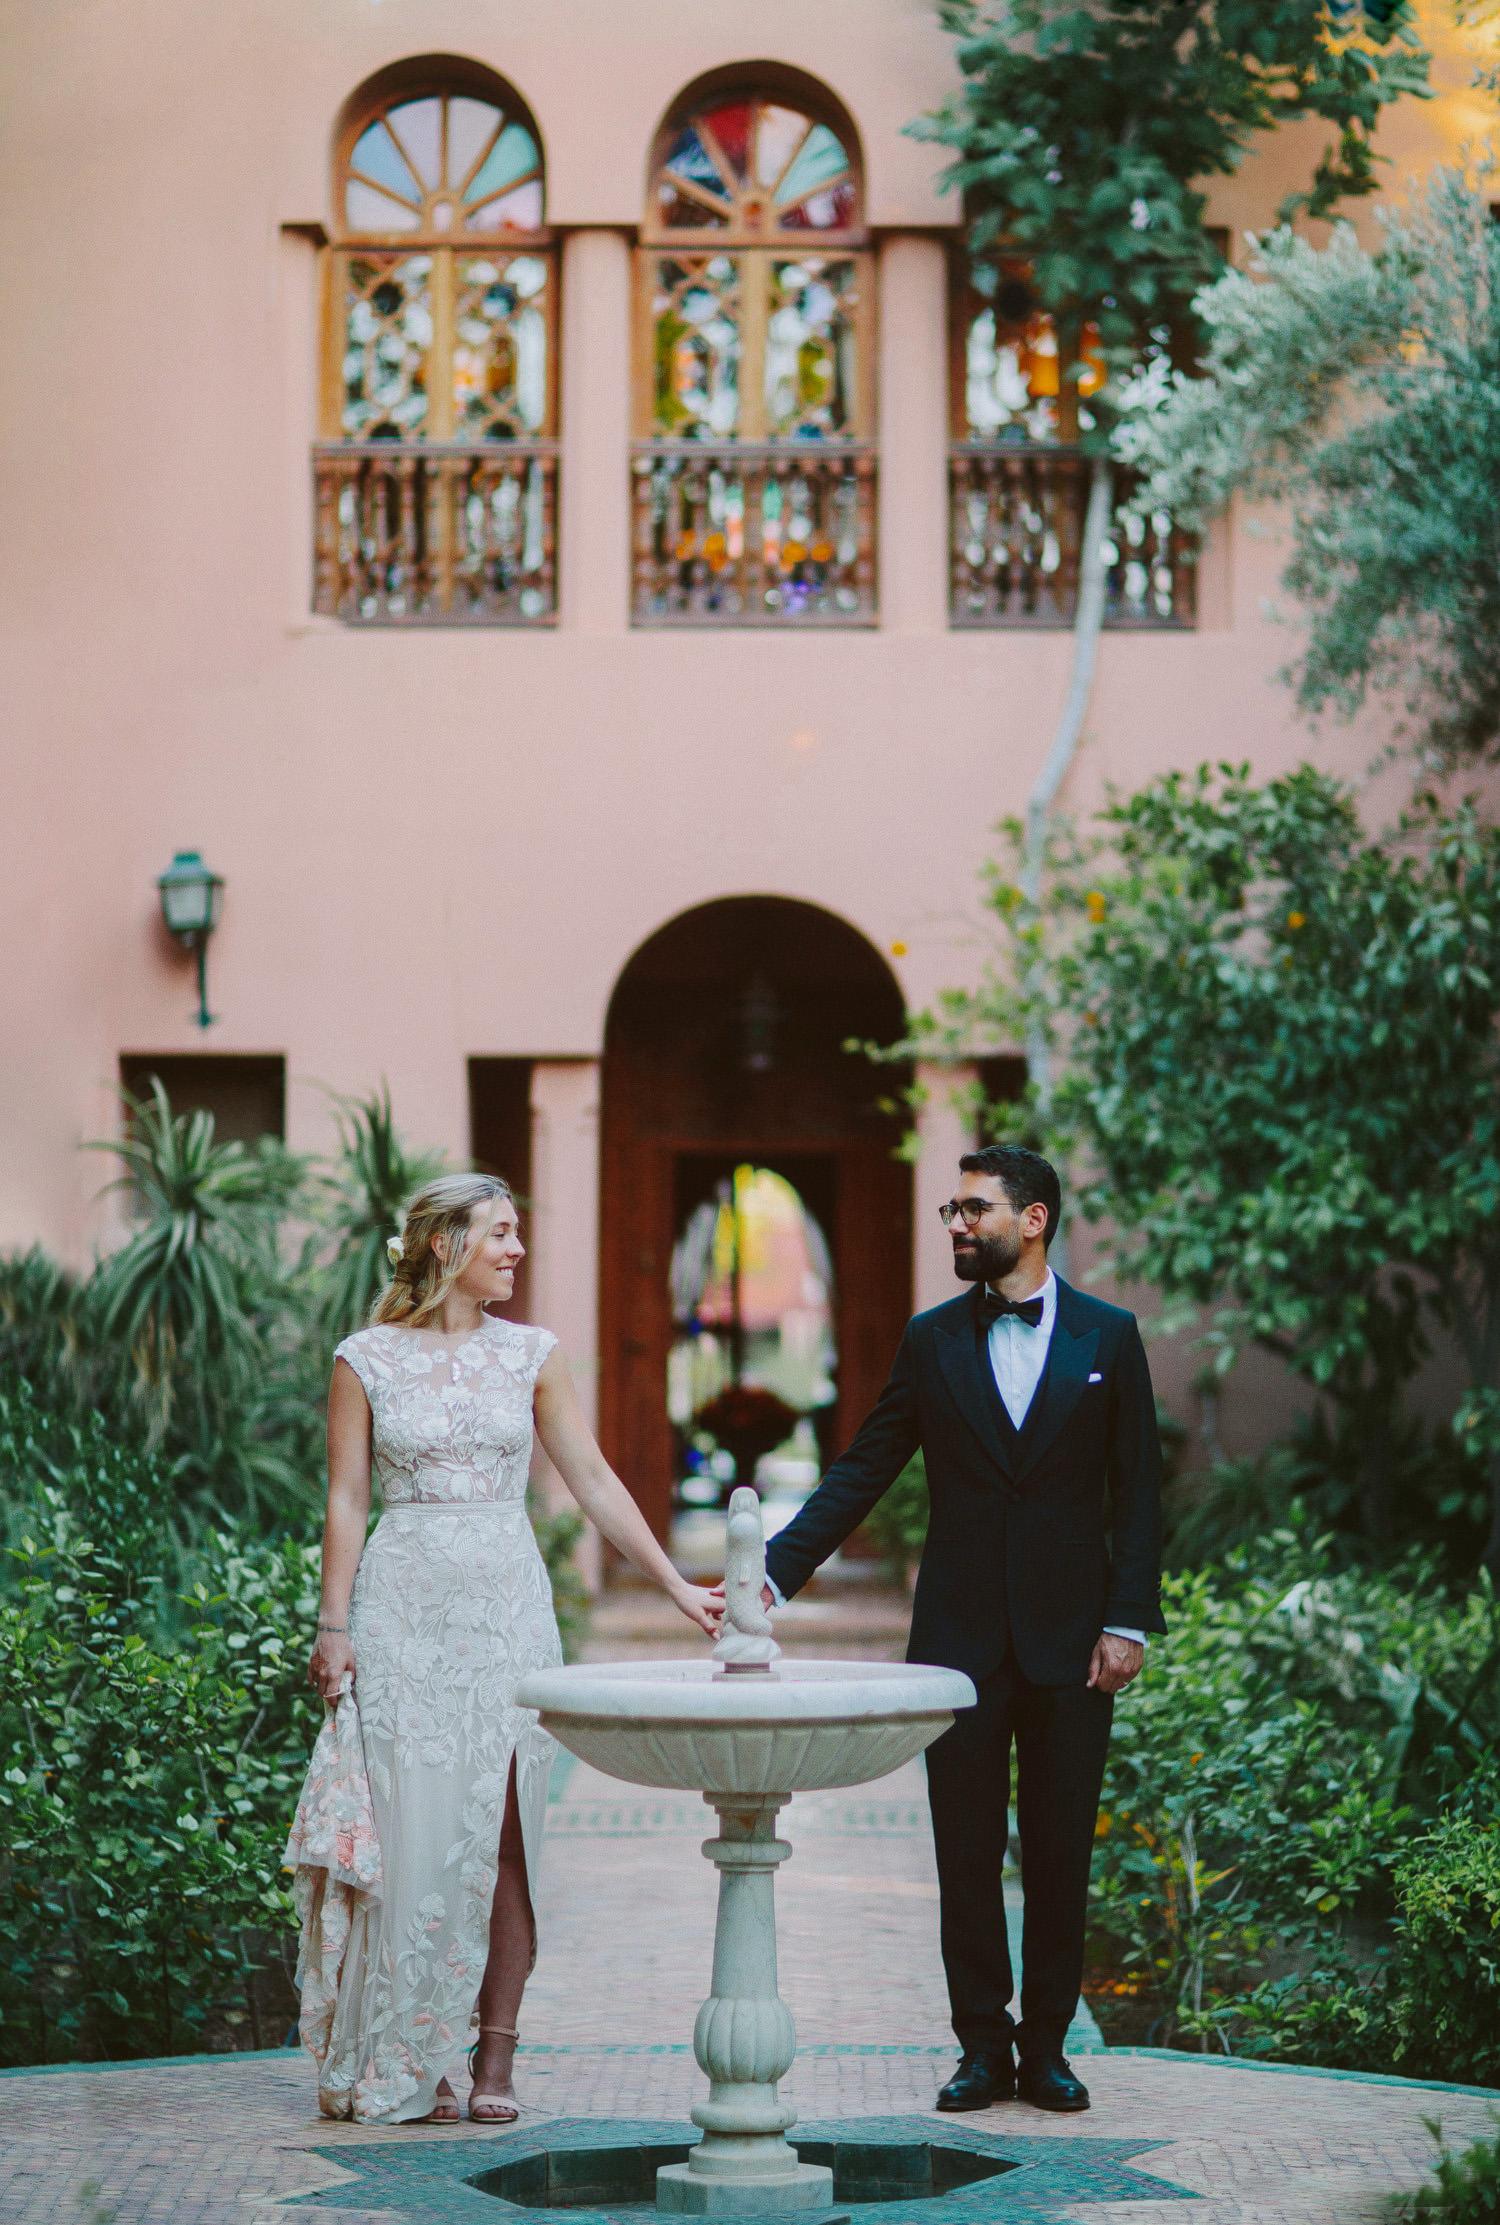 Black tie Marrakech wedding couple holding hands